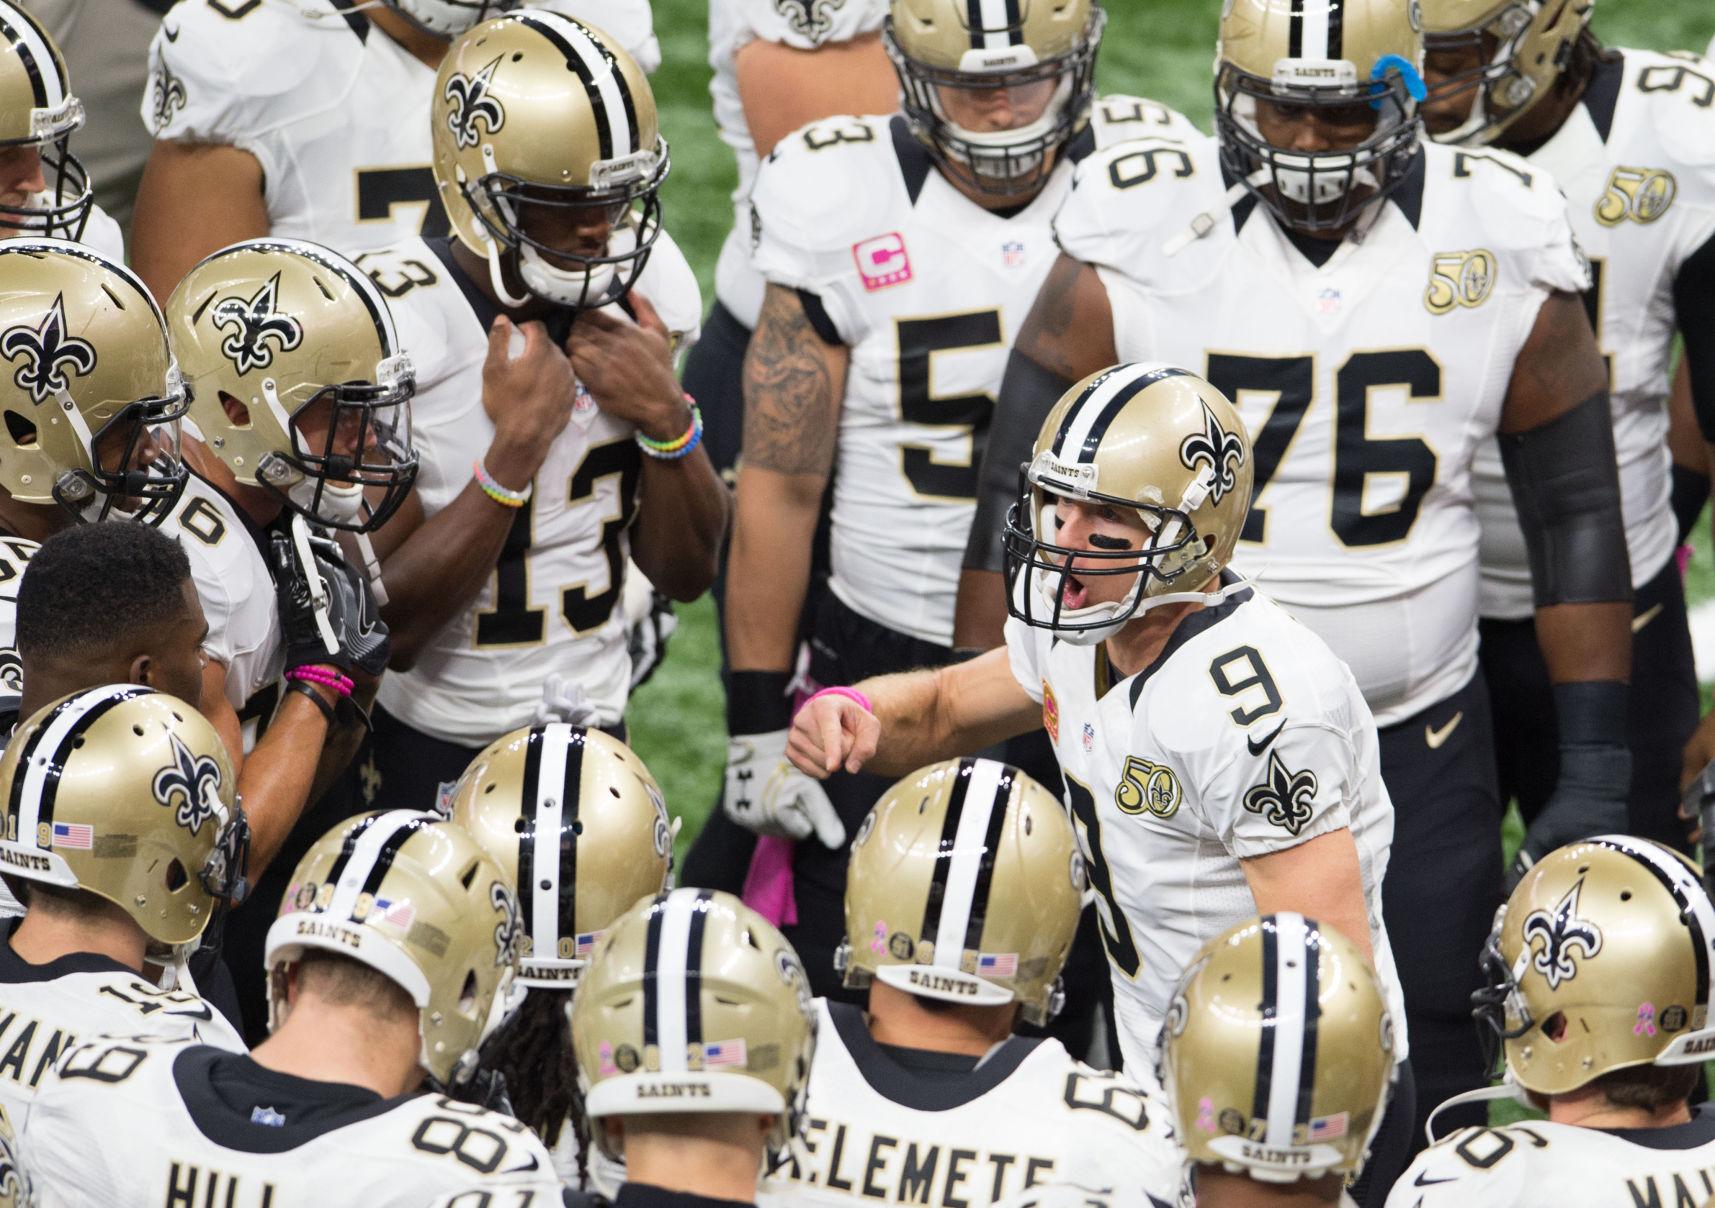 Who Will Win Atlanta Falcons vs. New Orleans Saints? A.I. Predicts ...